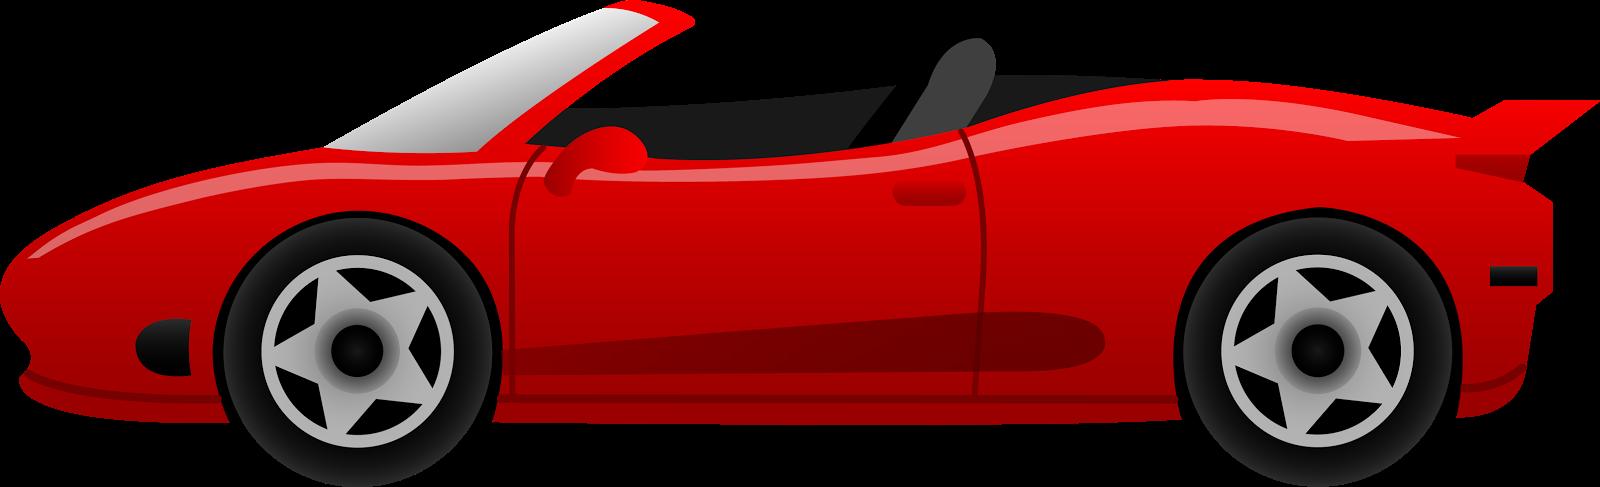 Clipart Car - ClipartFest-Clipart car - ClipartFest-10